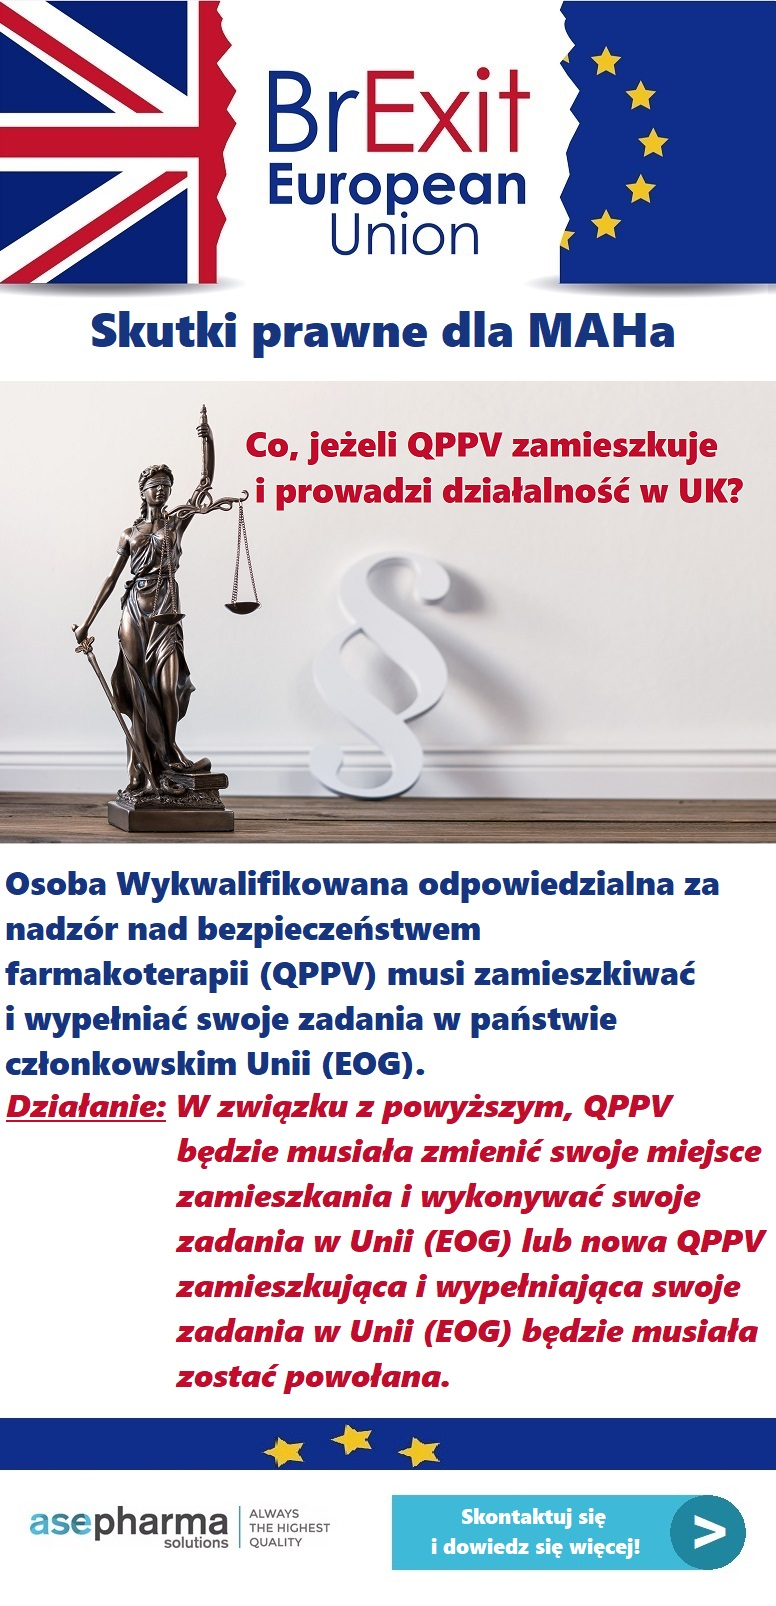 QPPV resides in UK